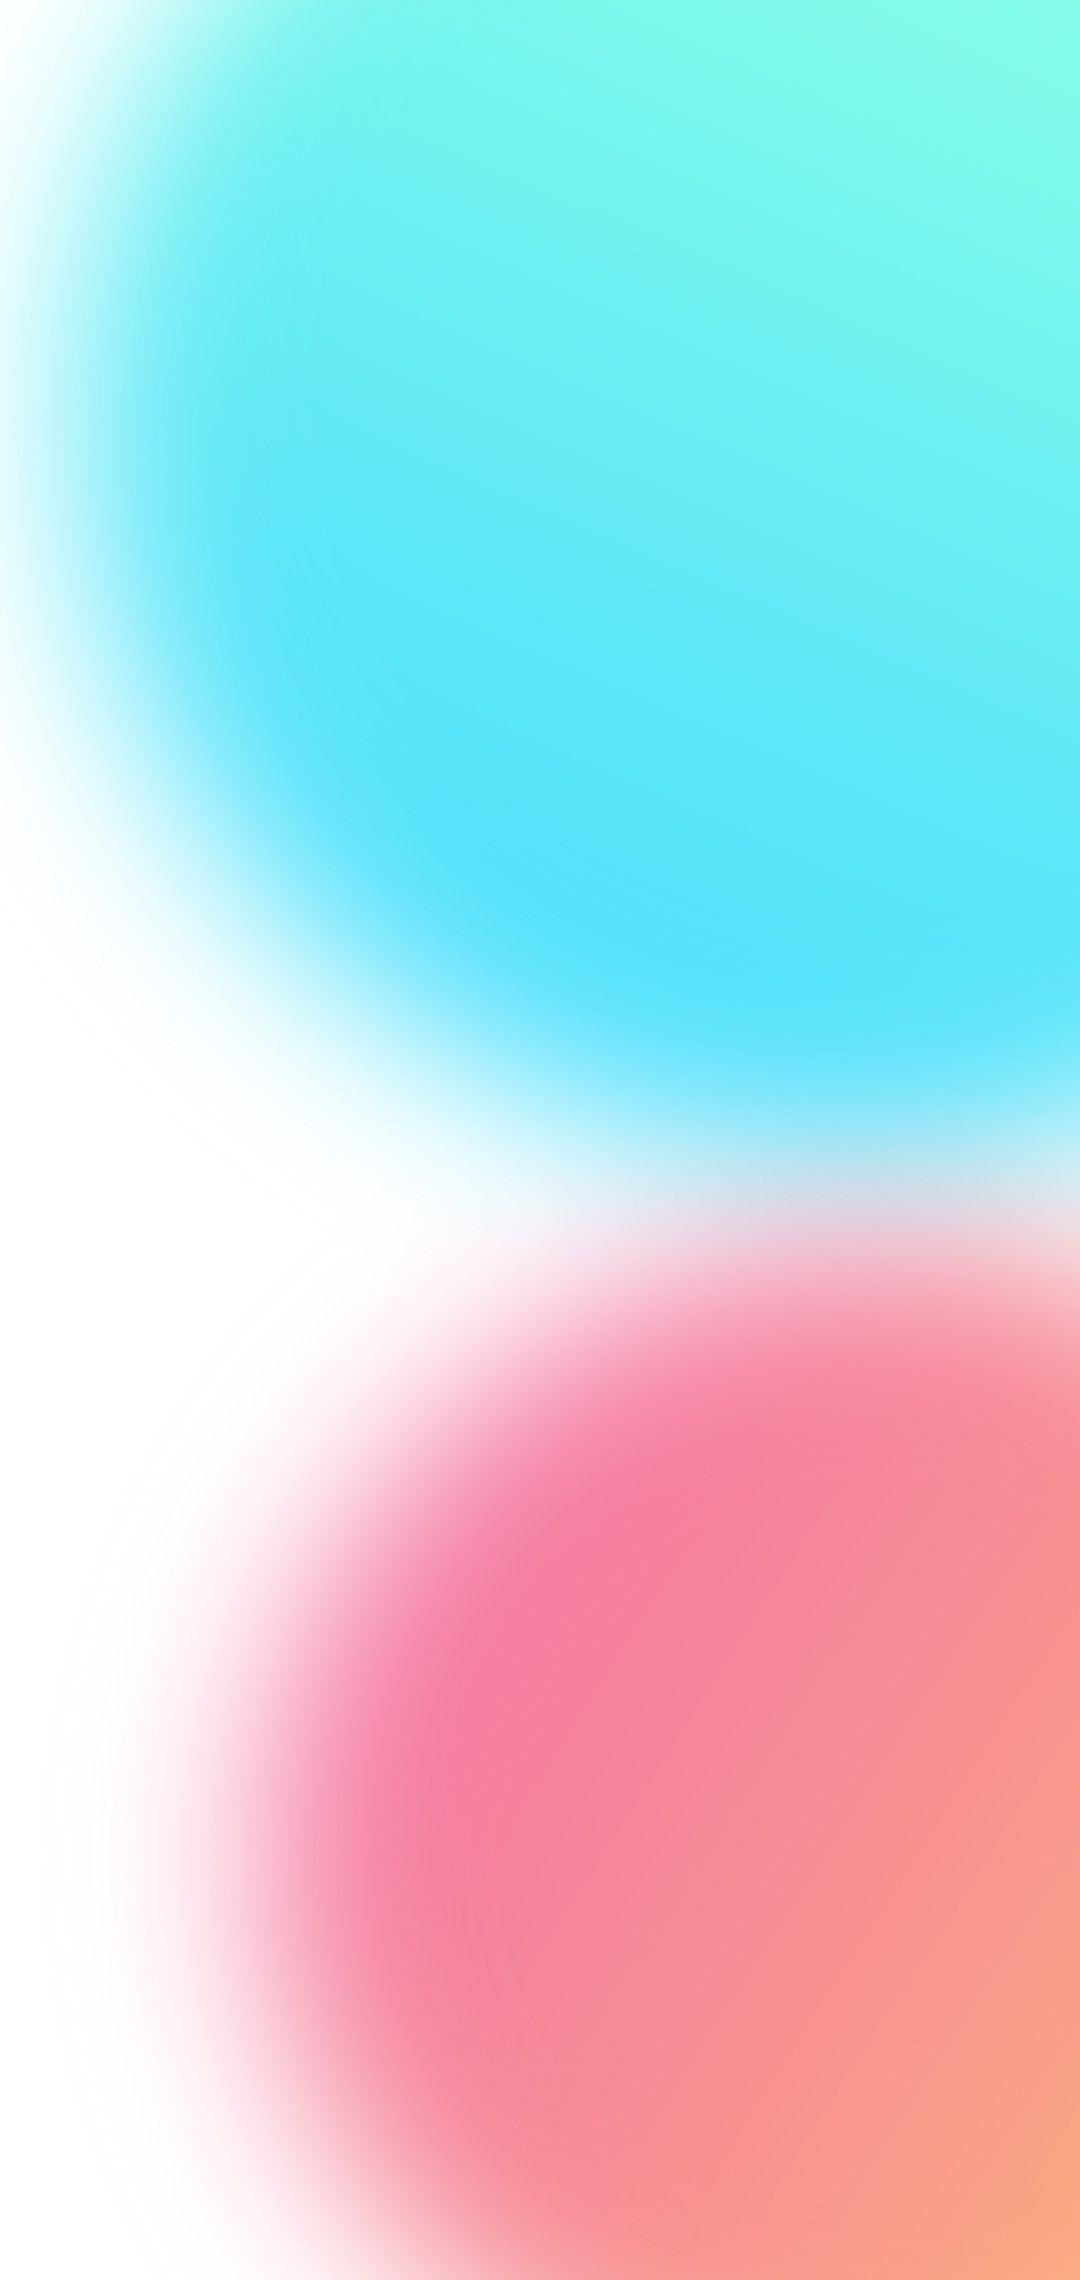 Xiaomi Redmi Note 7 Wallpapers: Xiaomi Redmi Note 7 Stock Wallpaper 04